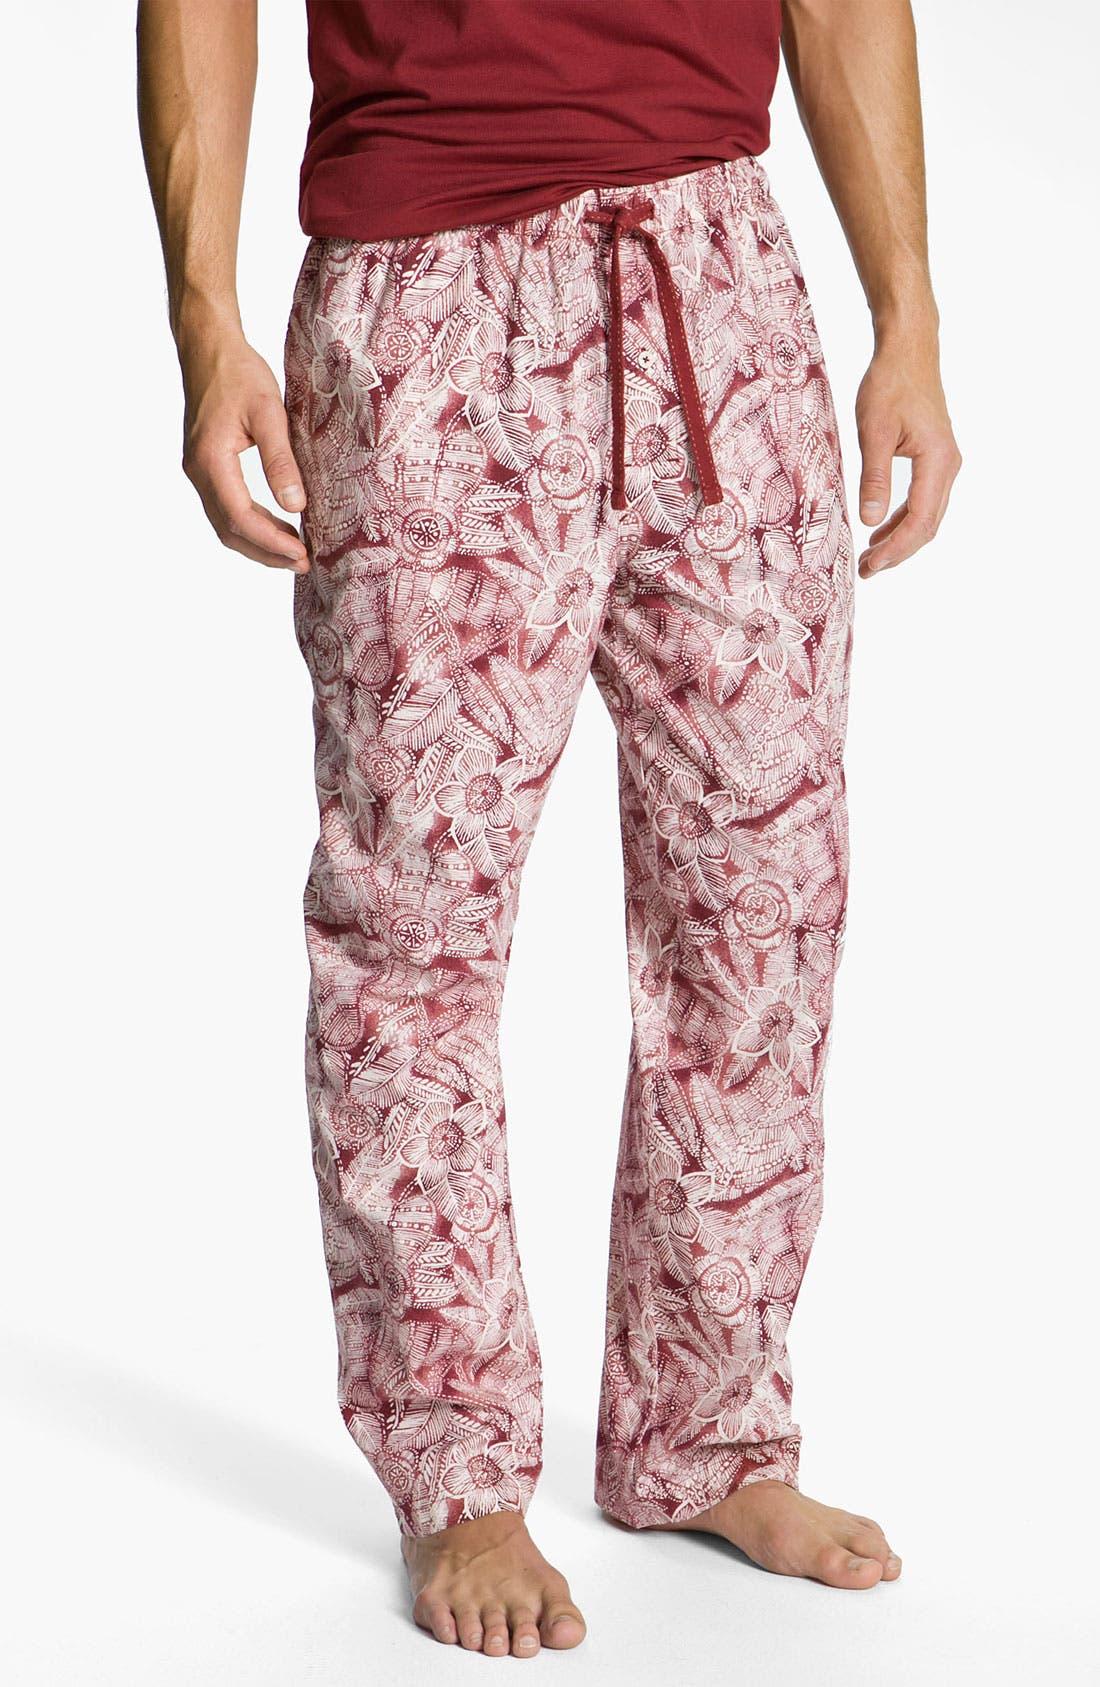 Alternate Image 1 Selected - Tommy Bahama 'Batik' Lounge Pants